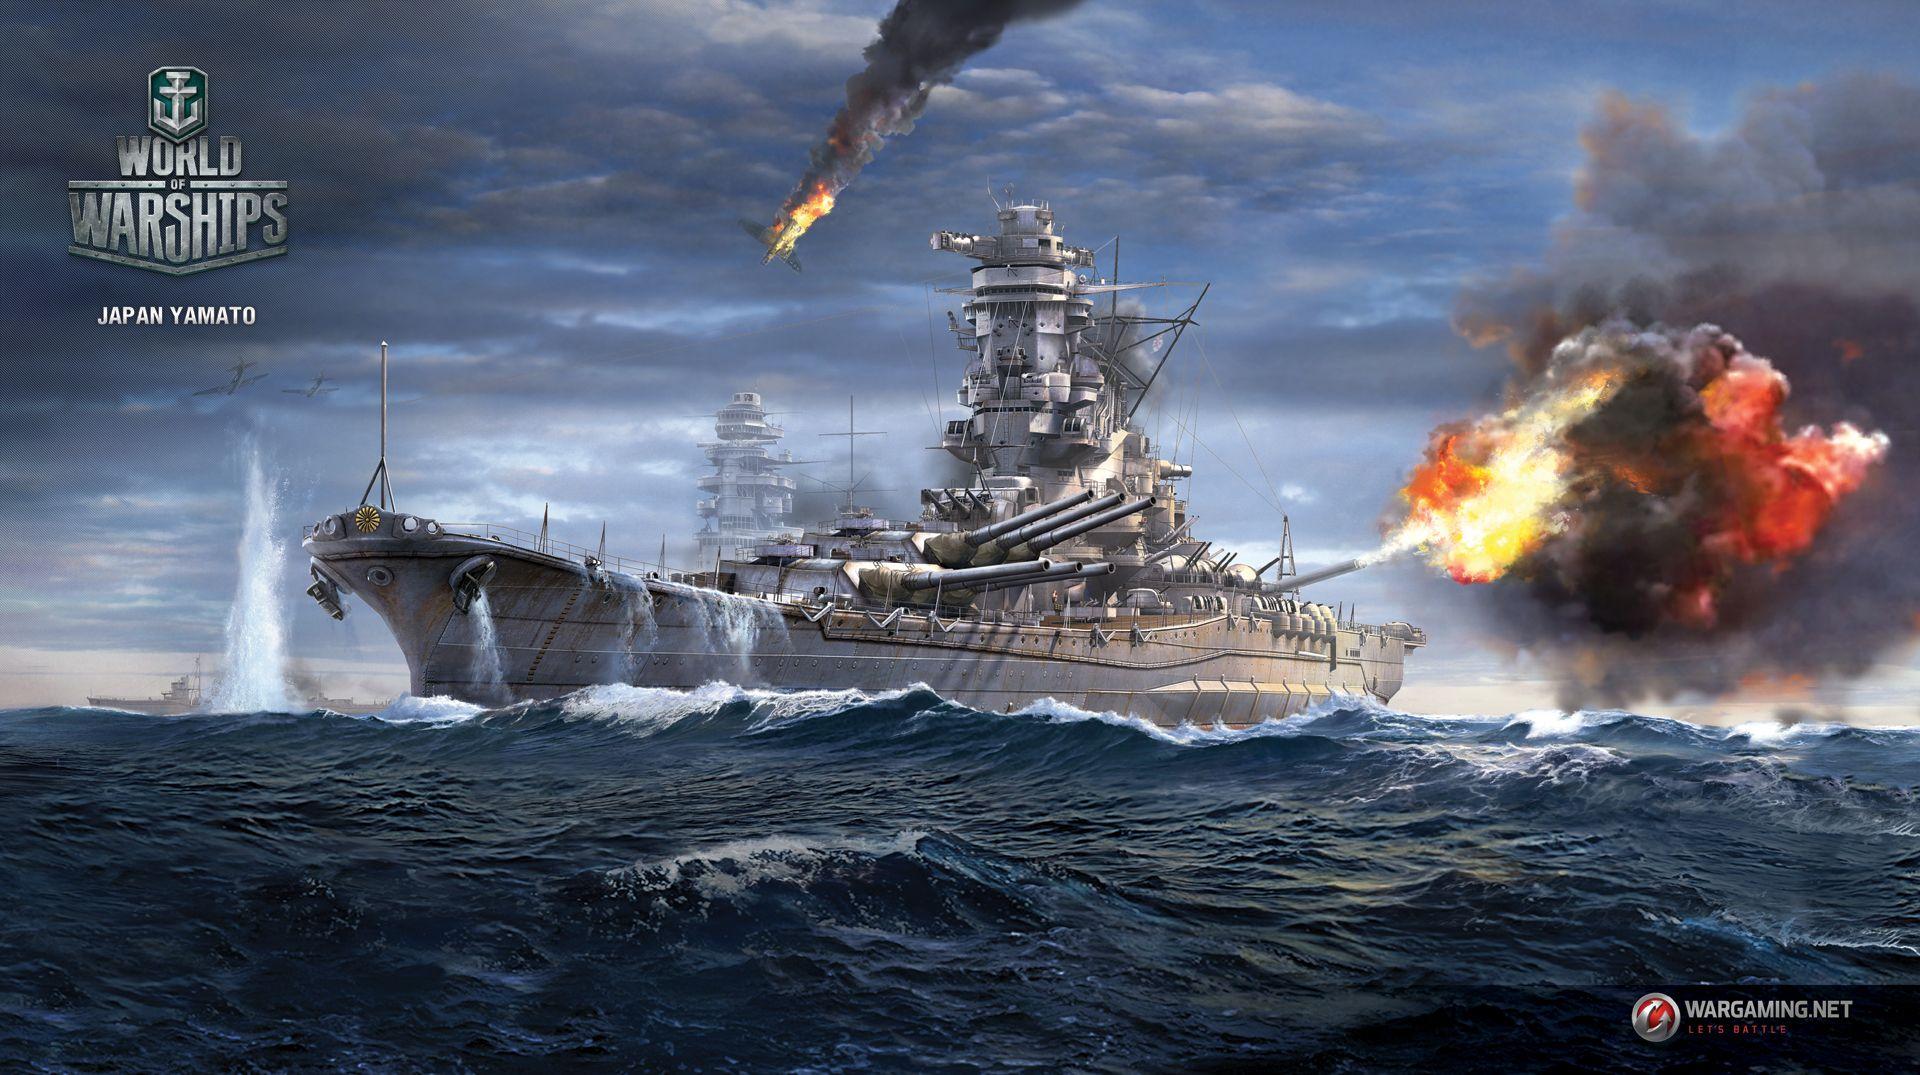 Japan Yamato Worldofwarships World Of Warships Wallpaper Yamato Battleship Battleship